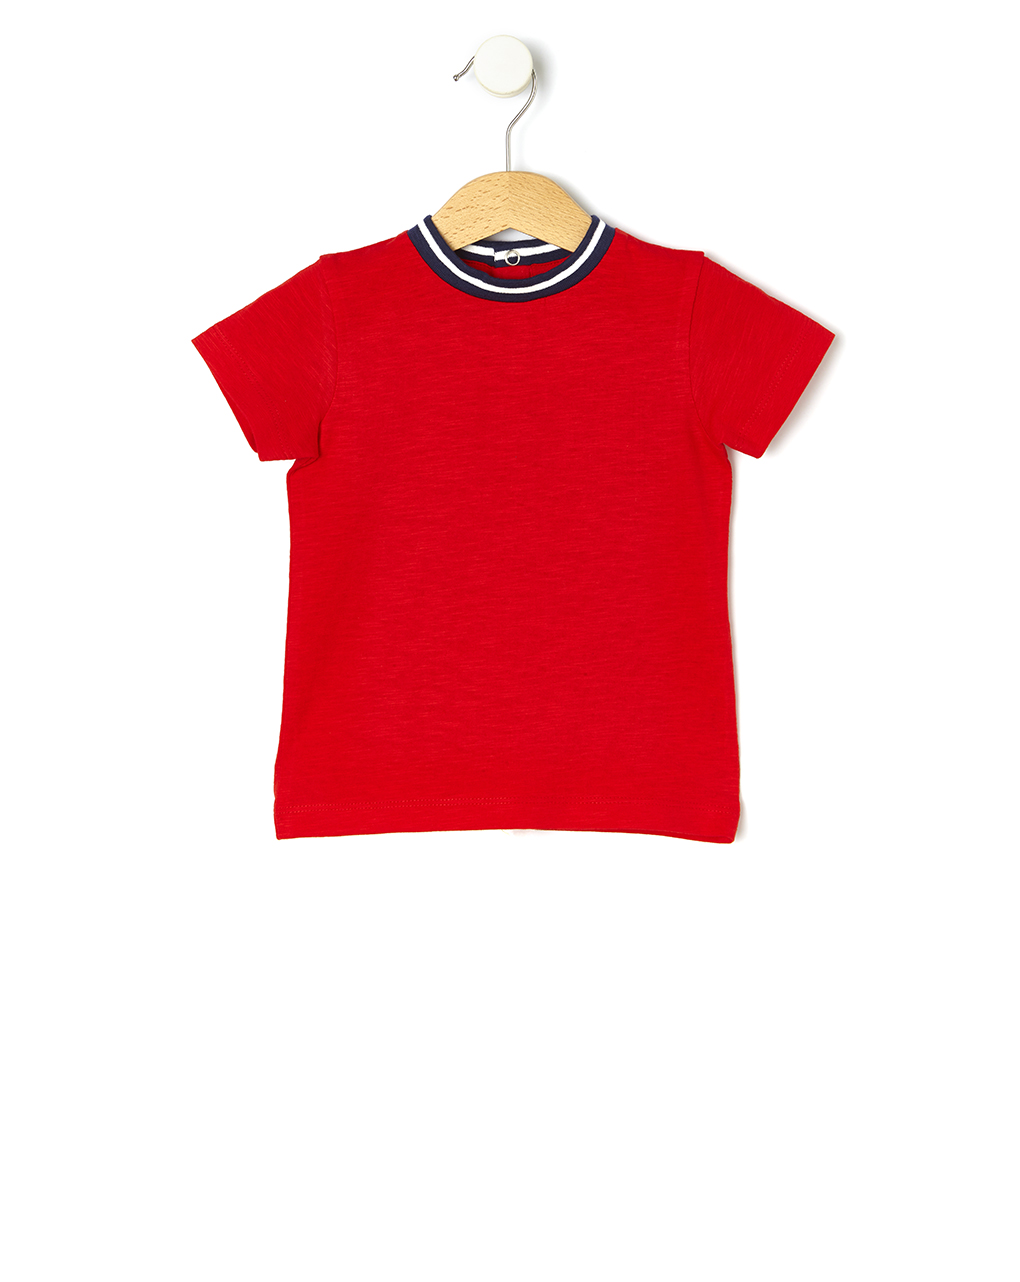 T-shirt in cotone slub - Prénatal